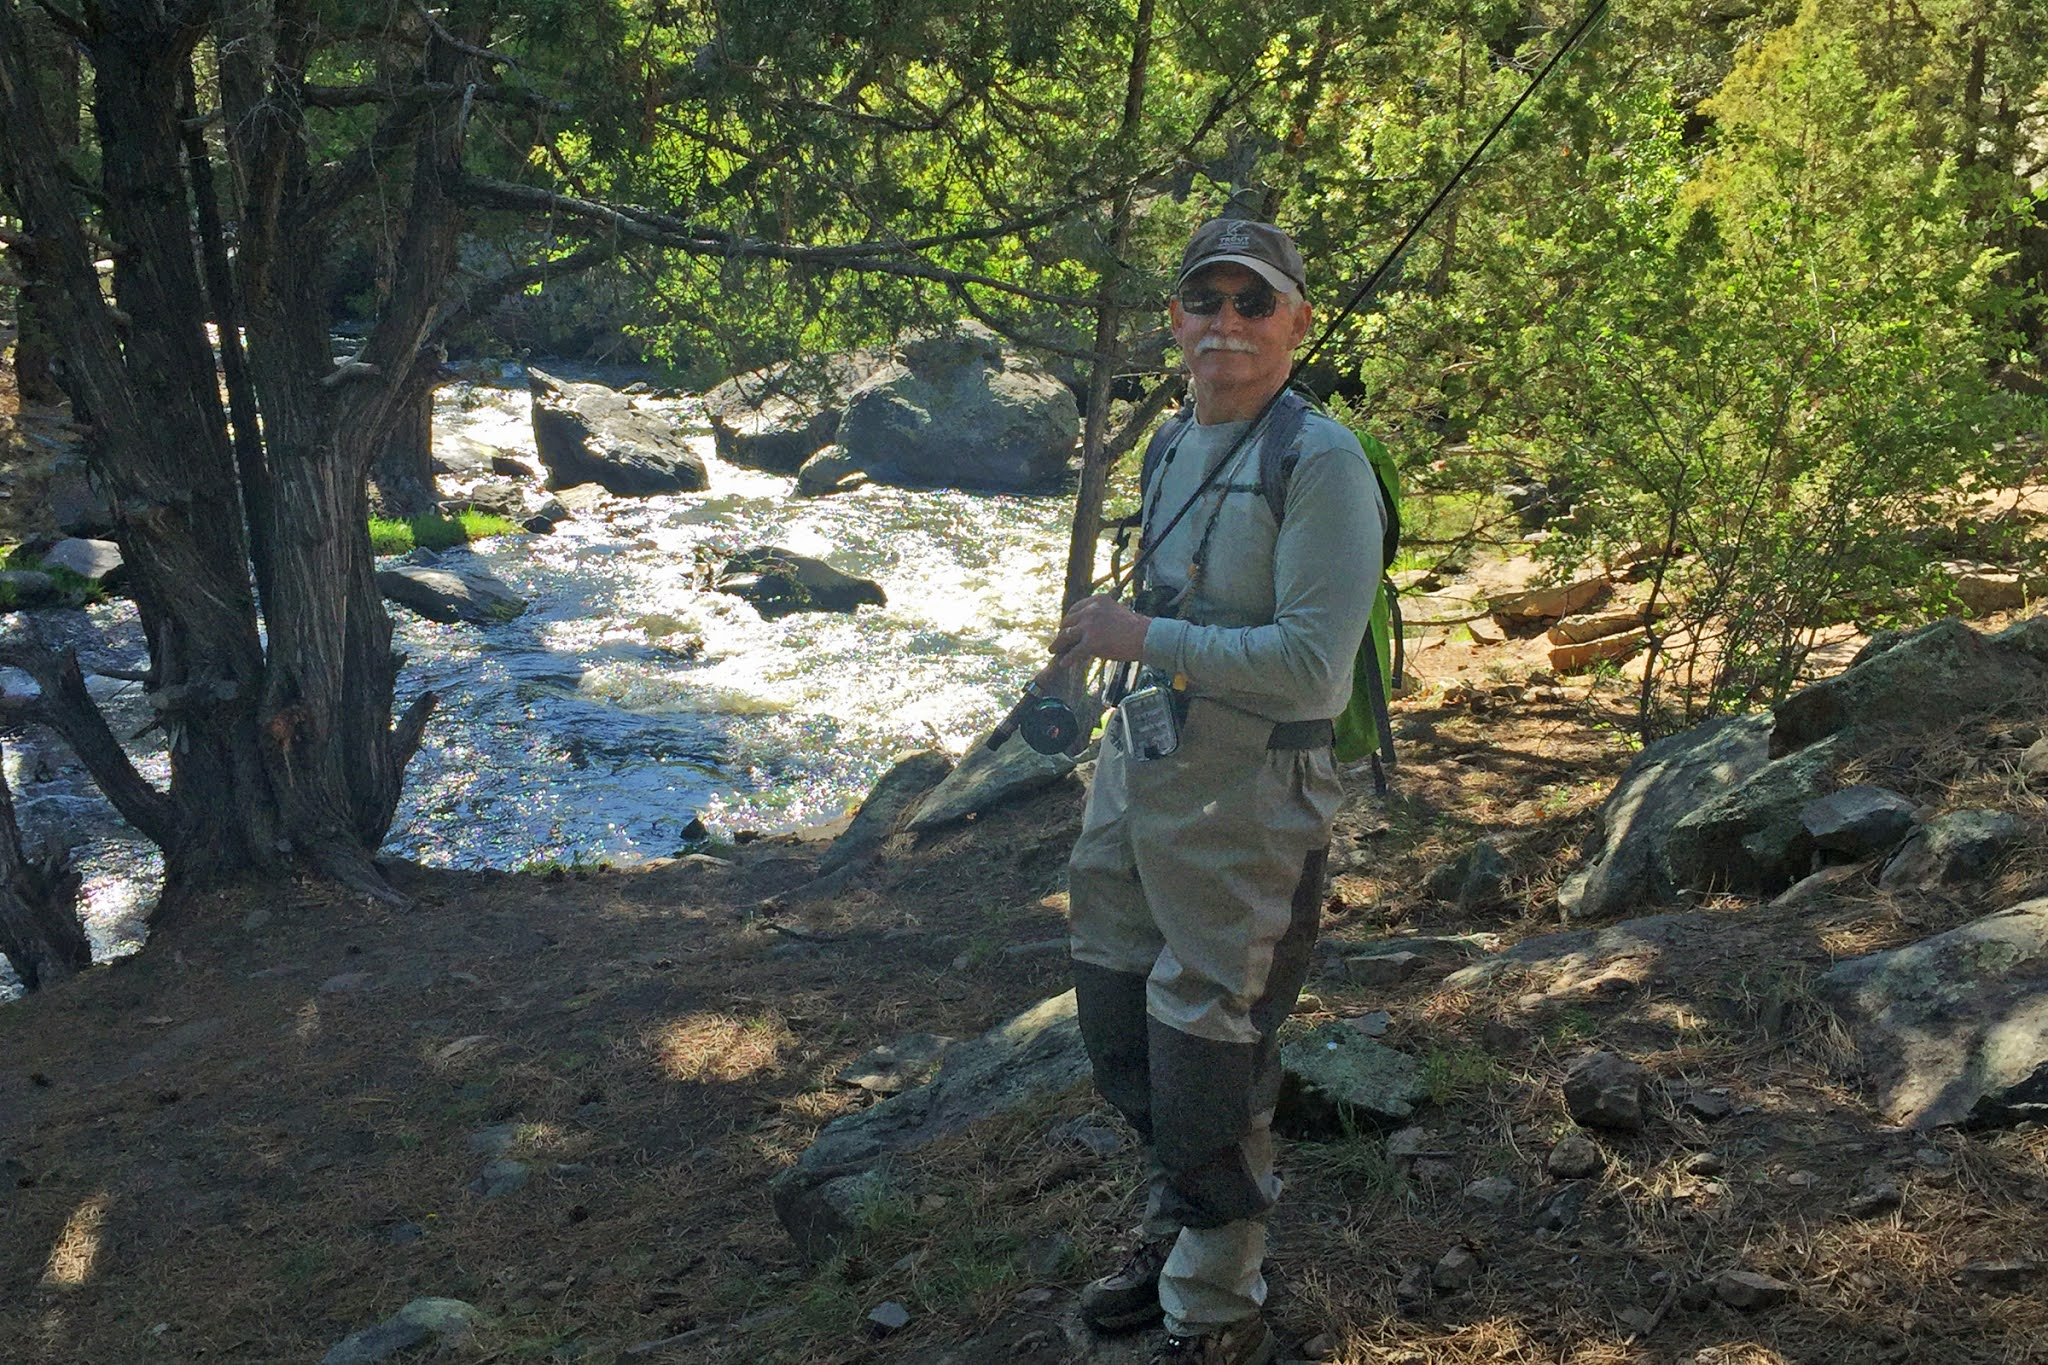 Southern Utah's Pine Valley Recreation Area - FisherDad